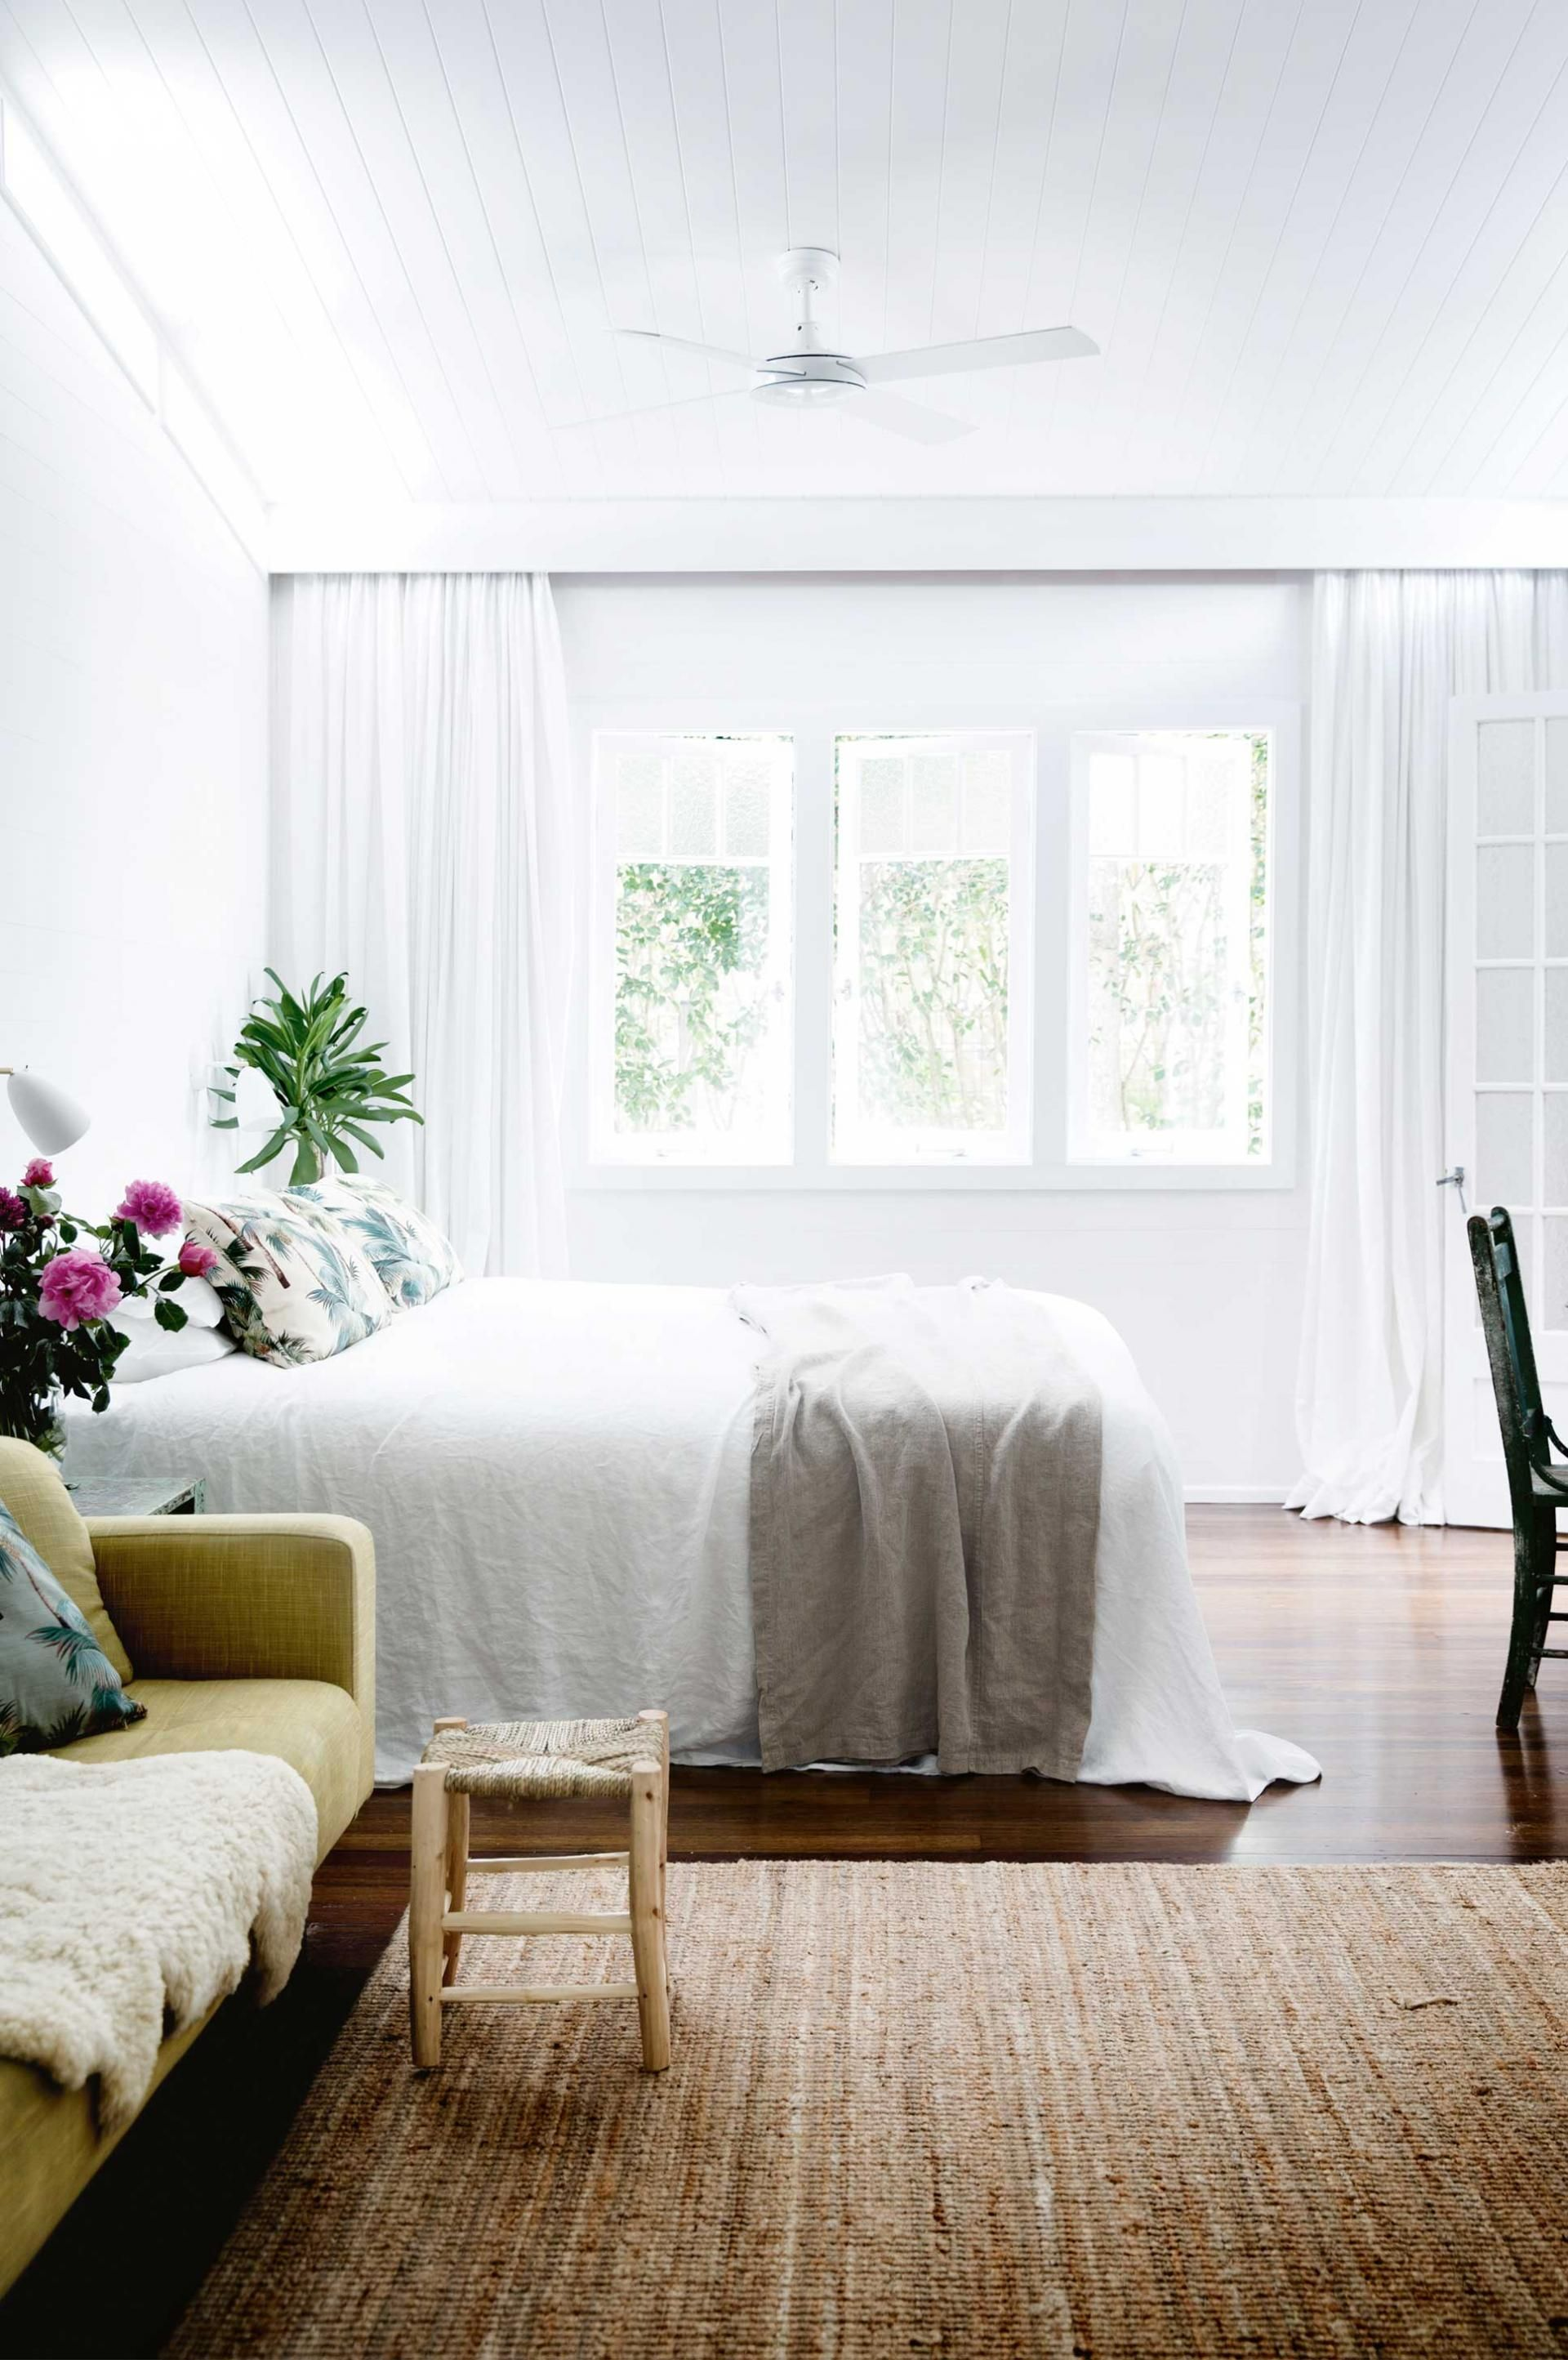 Room white bedroom curtains fan jute rug Lowry home nov15 GORW